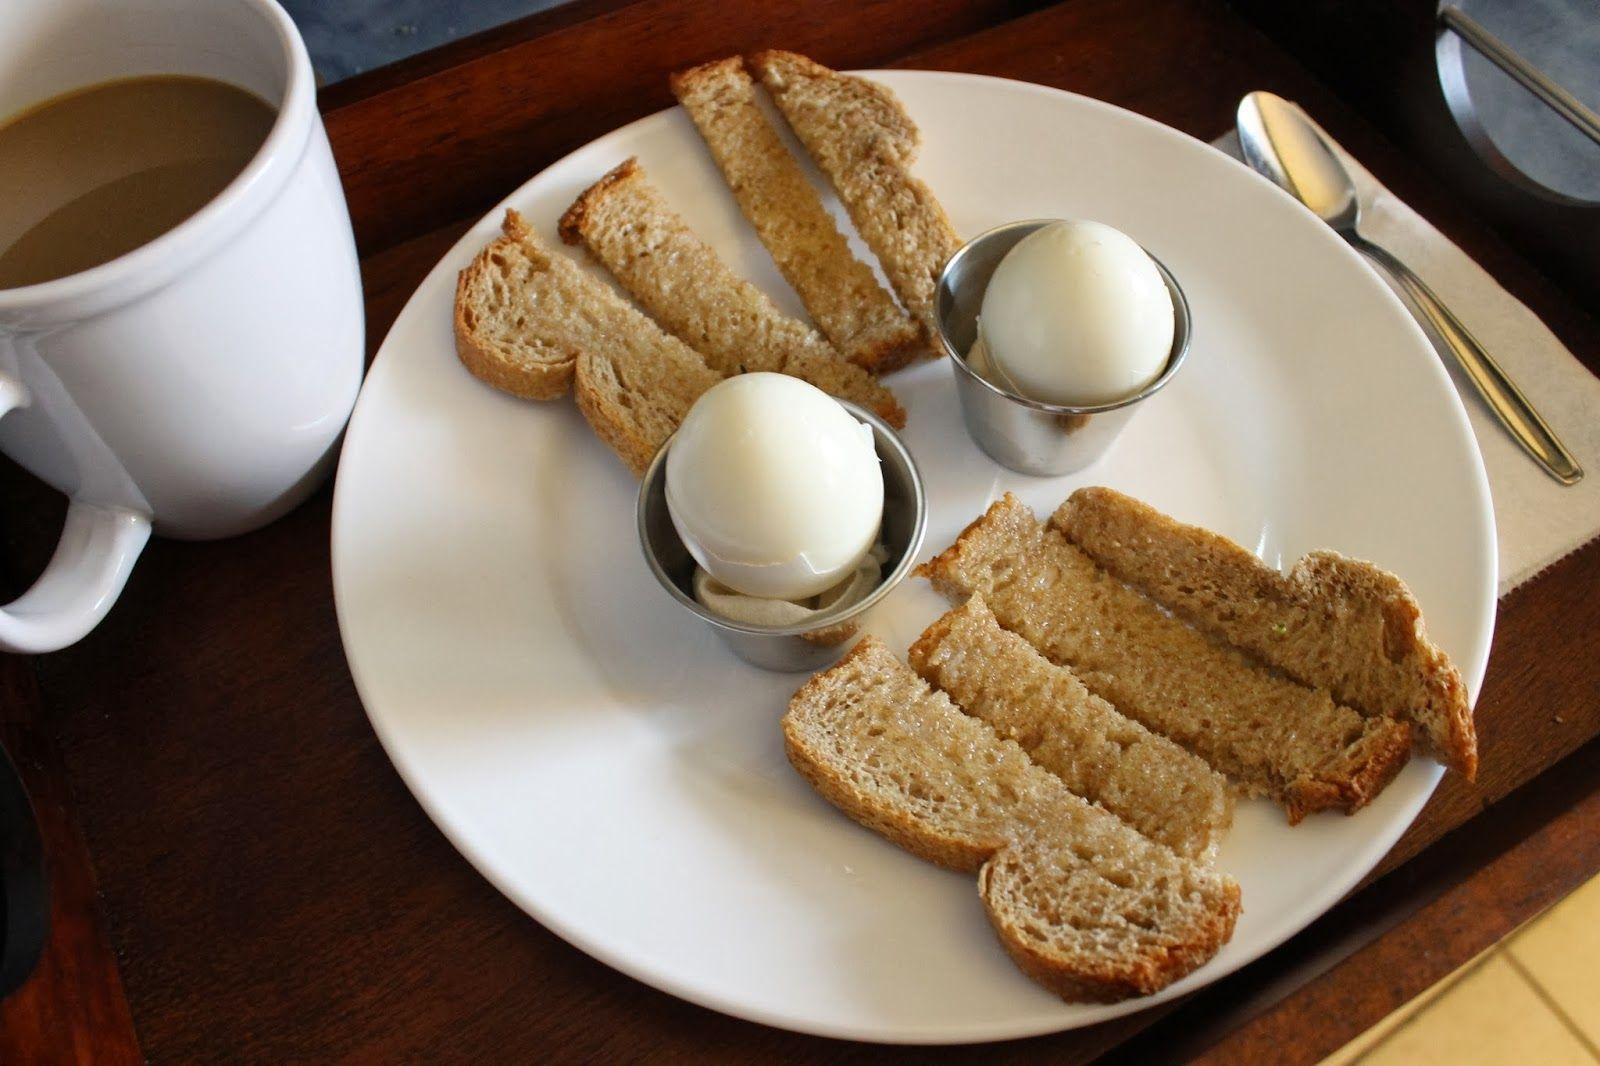 The Simple Treat | Breakfast in bread! Soft boiled eggs